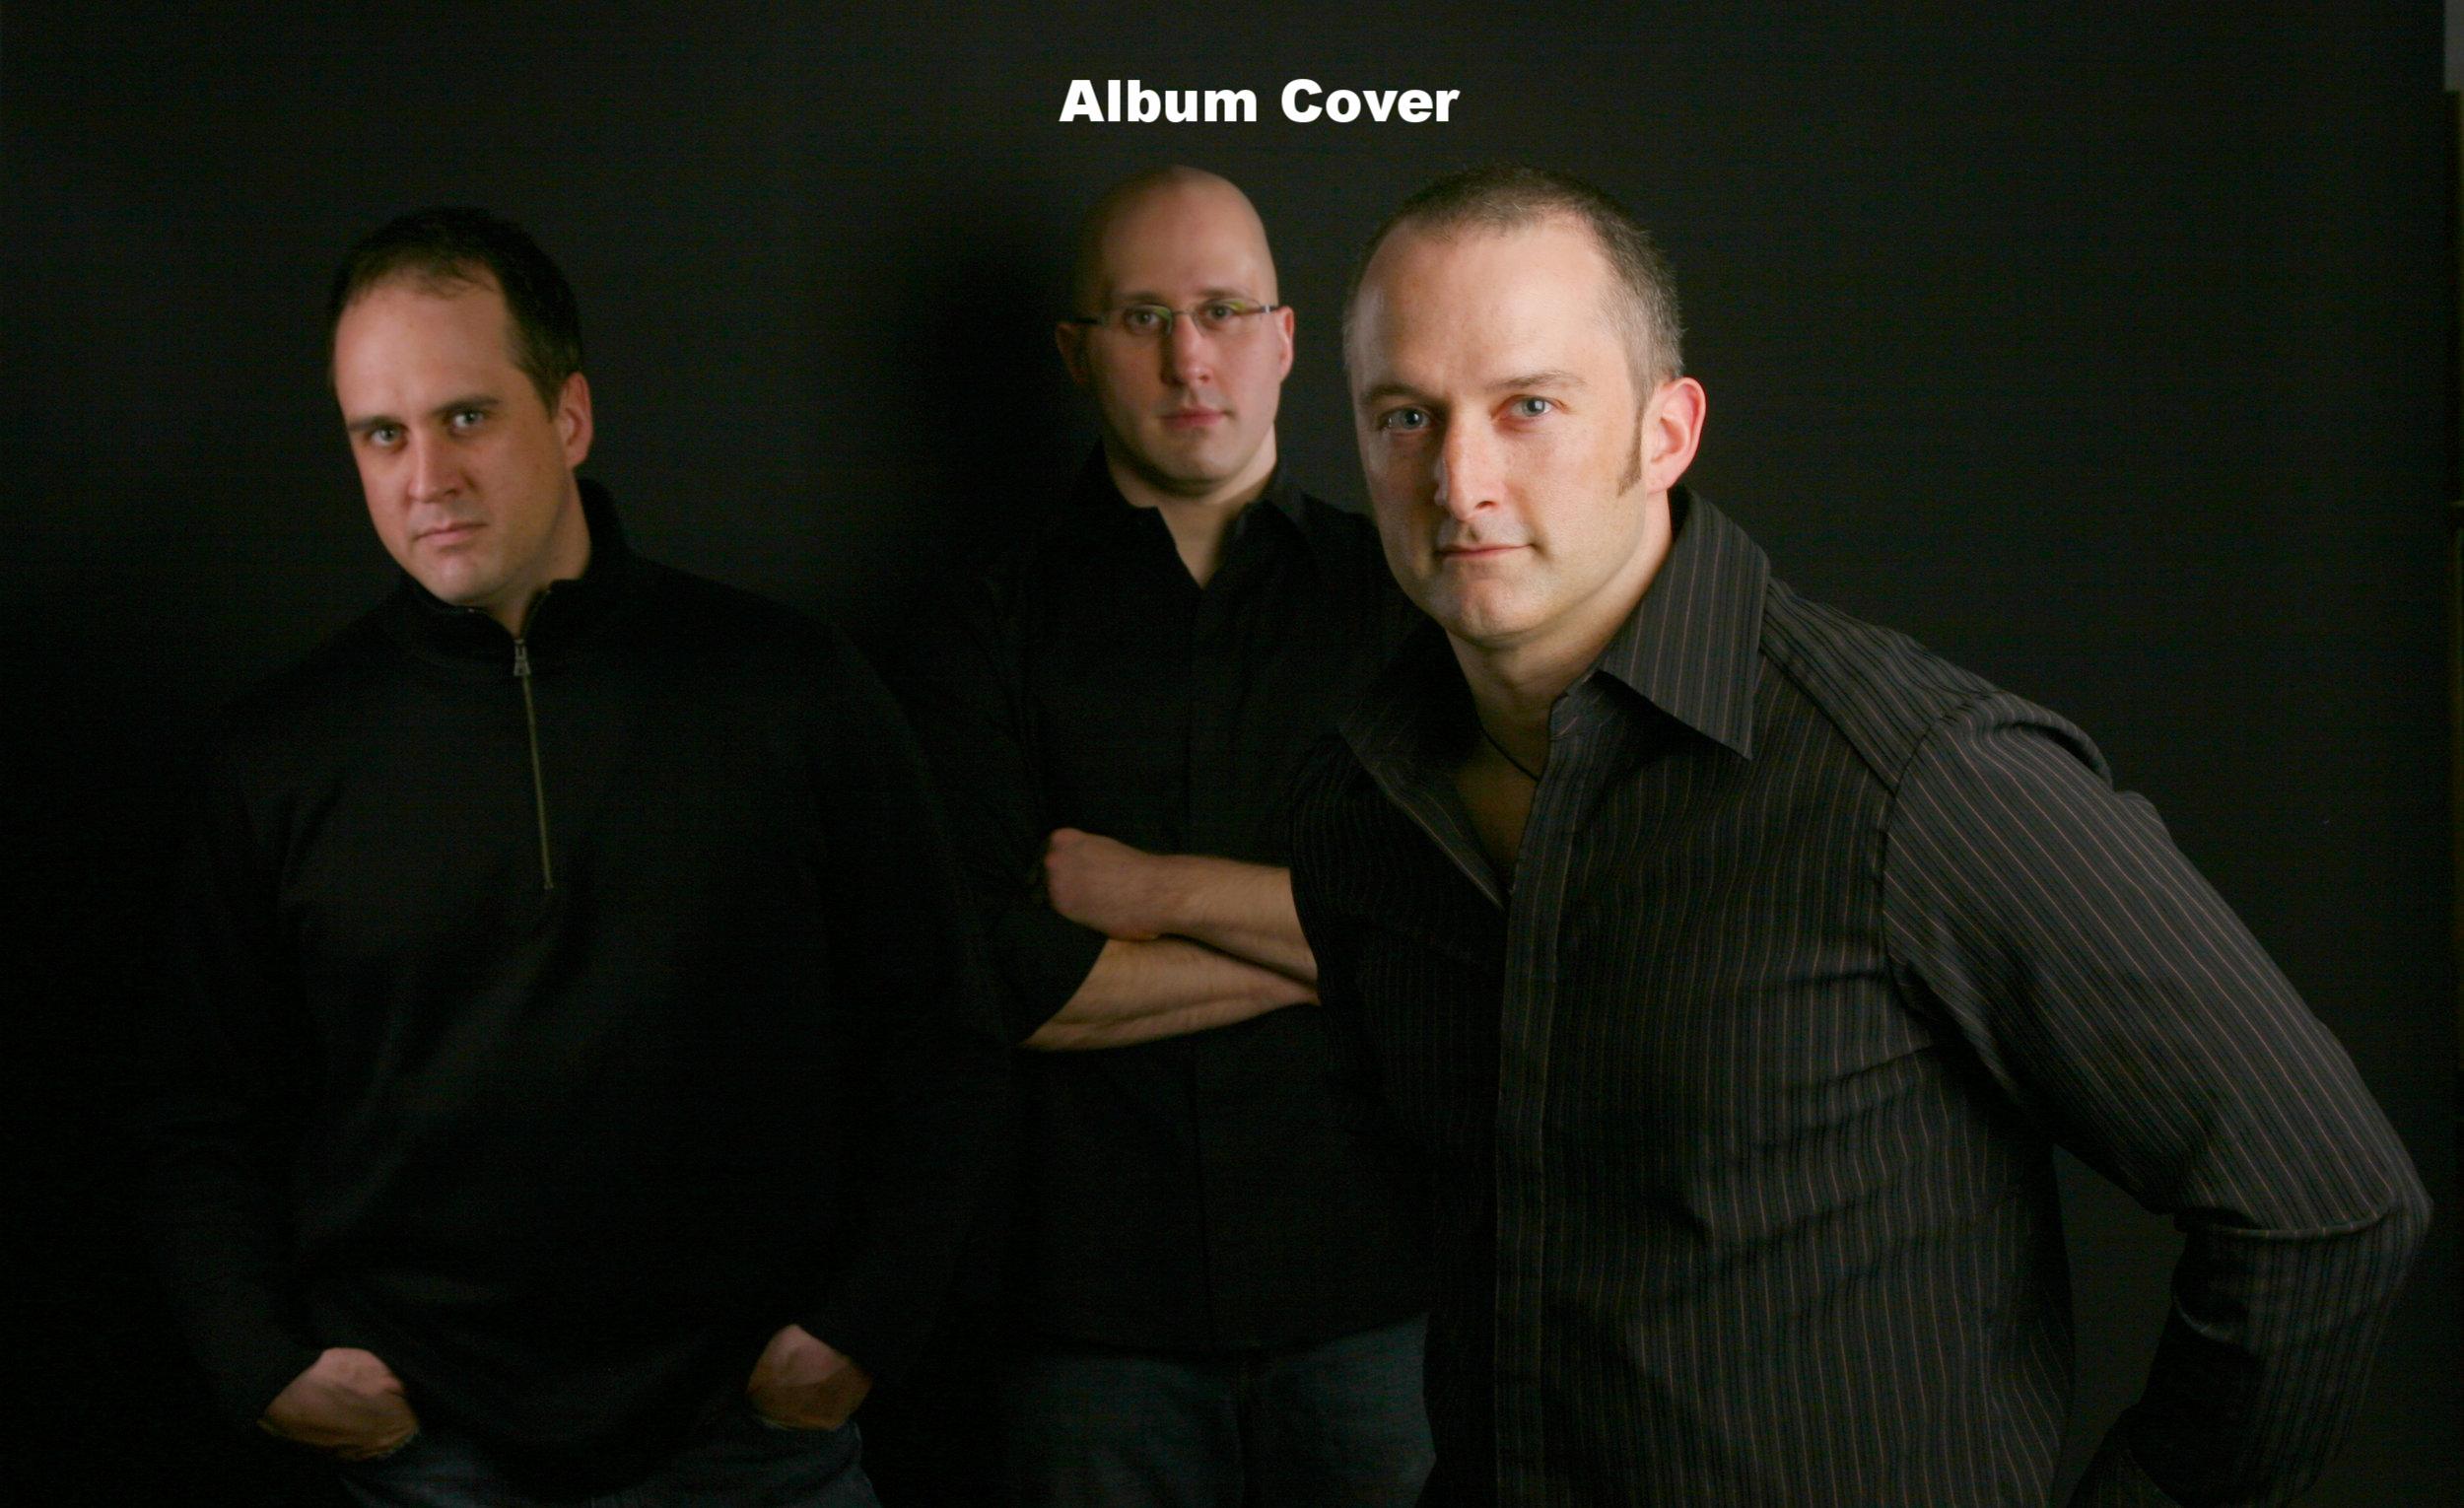 Music group cd cover shots commercial shoots Eugene Oregon.jpg